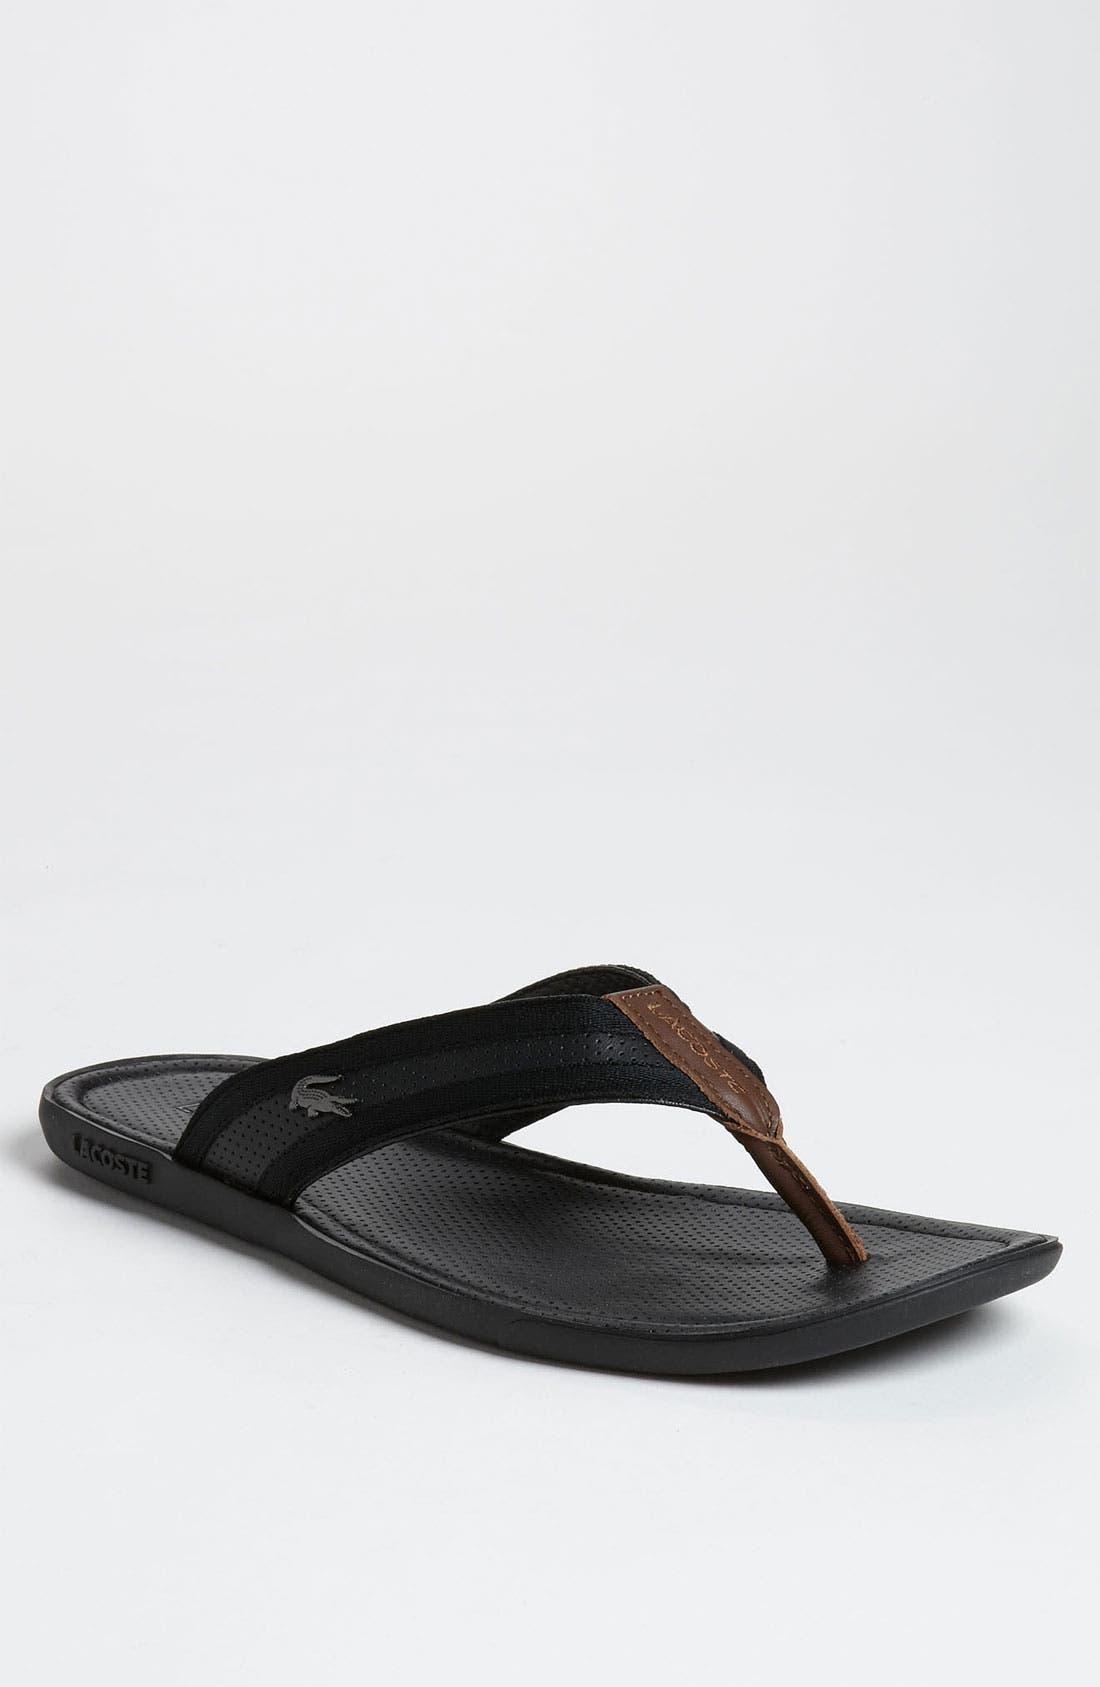 Main Image - Lacoste 'Carros 4' Flip Flop (Online Only)